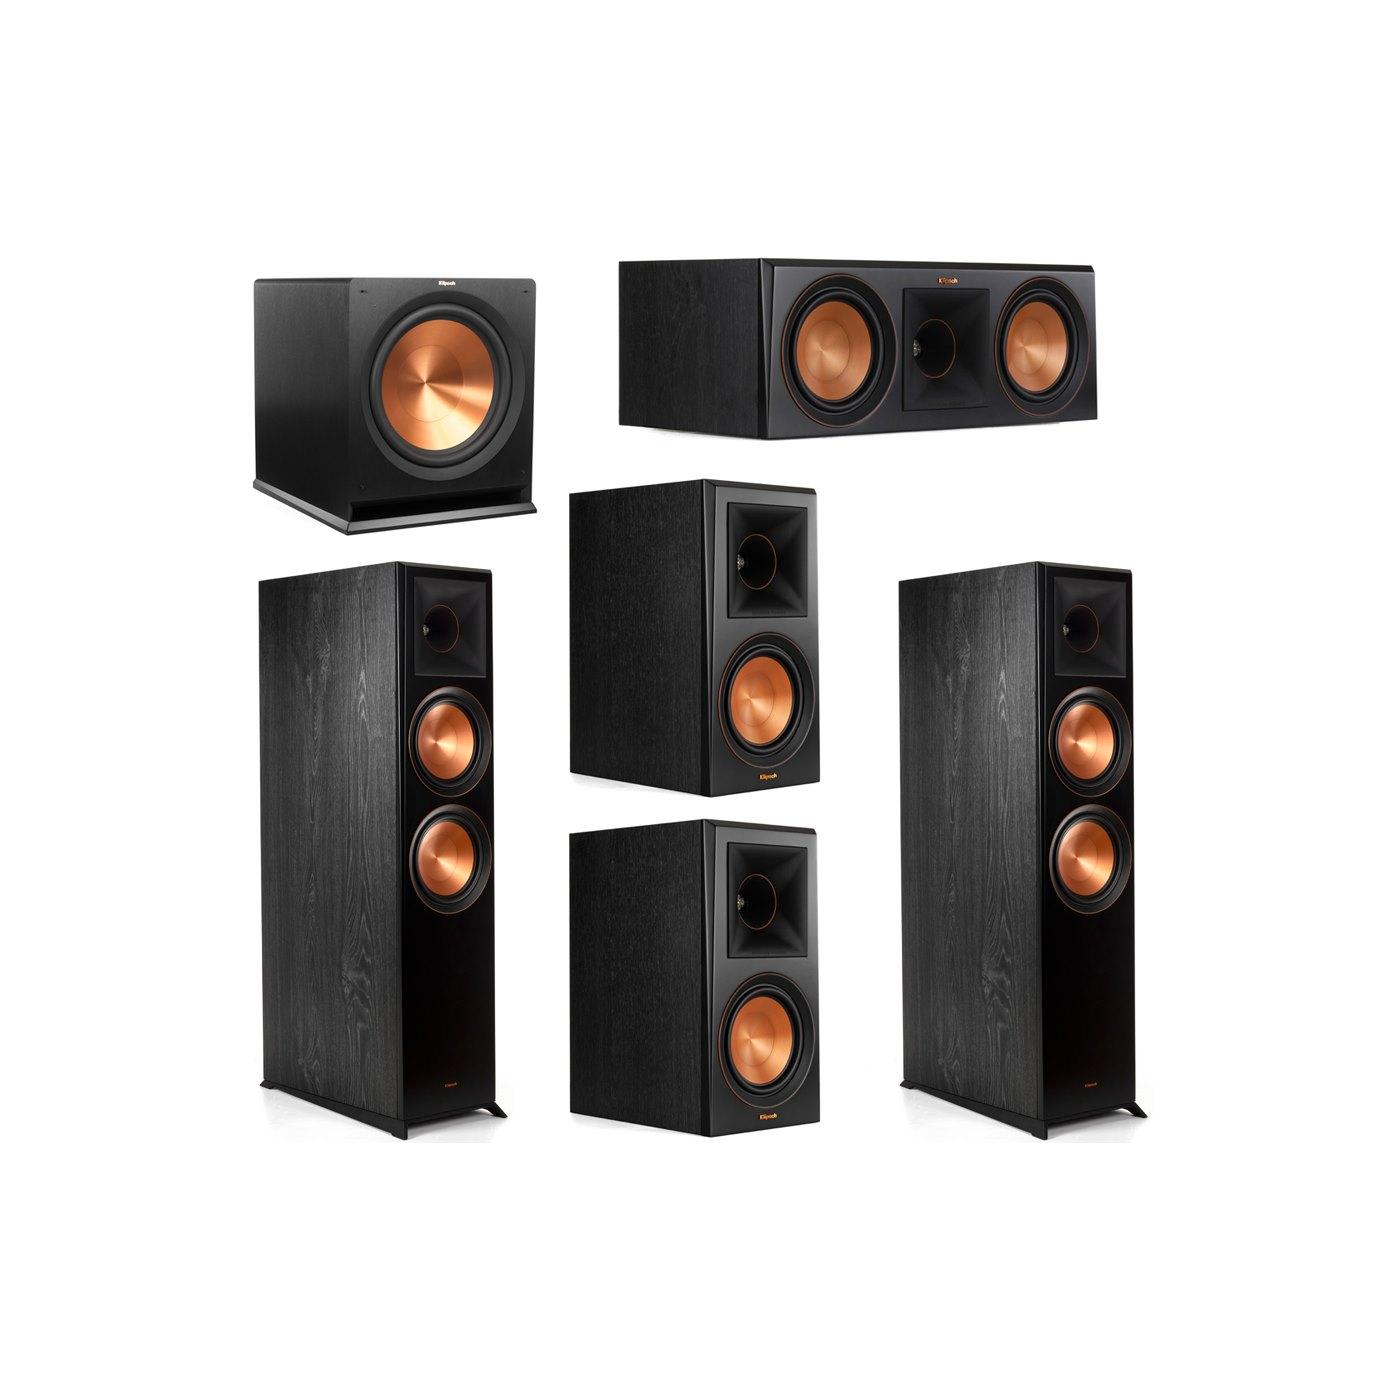 Klipsch 5.1 System with 2 RP-8000F Floorstanding Speakers, 1 Klipsch RP-600C Center Speaker, 2 Klipsch RP-600M Surround Speakers, 1 Klipsch R-115SW Subwoofer